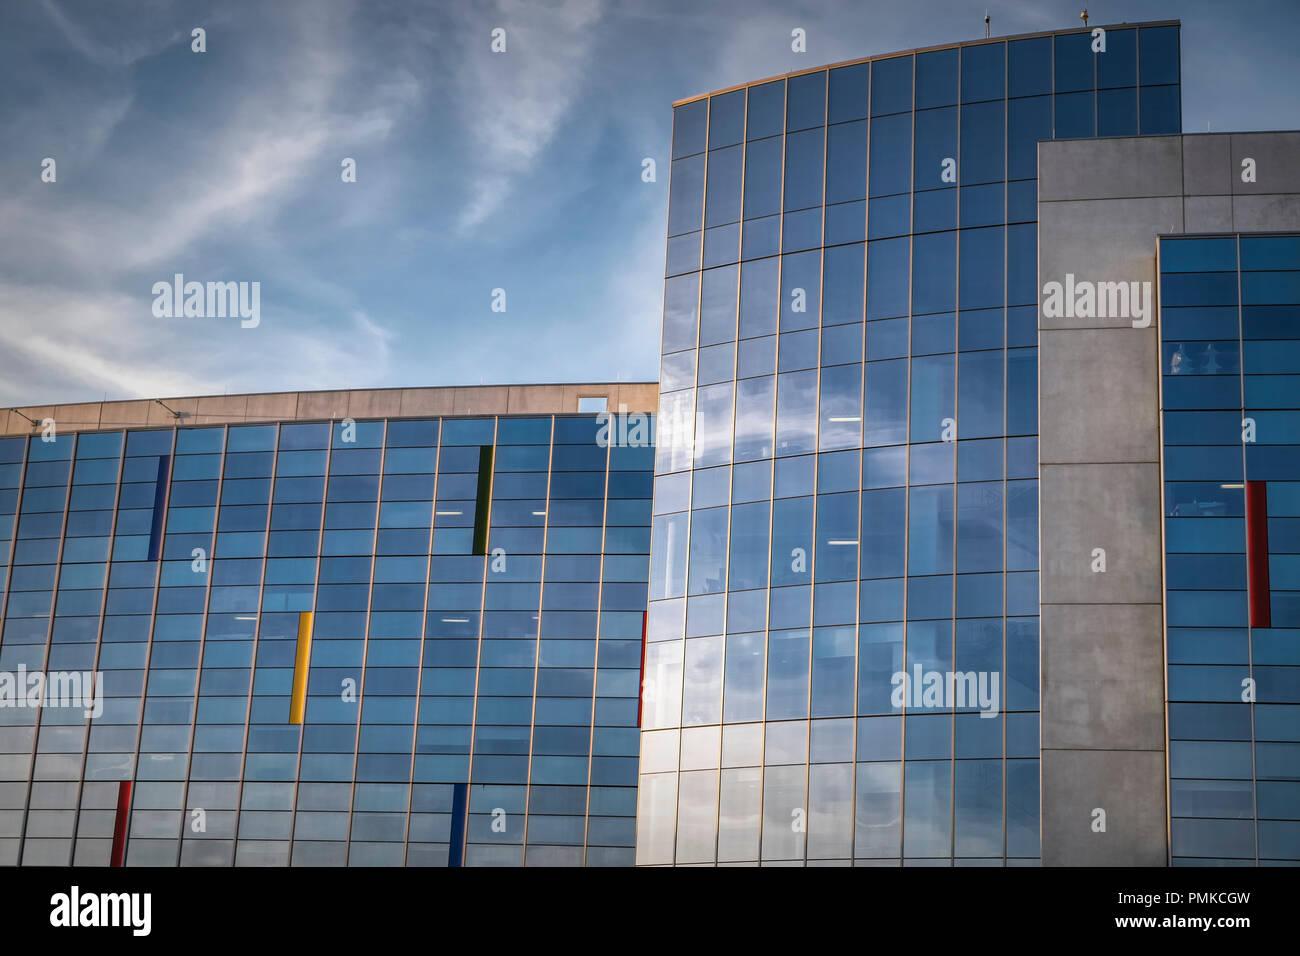 Benjamin Russel Children's Hospital, Birmingham Alabama - Stock Image